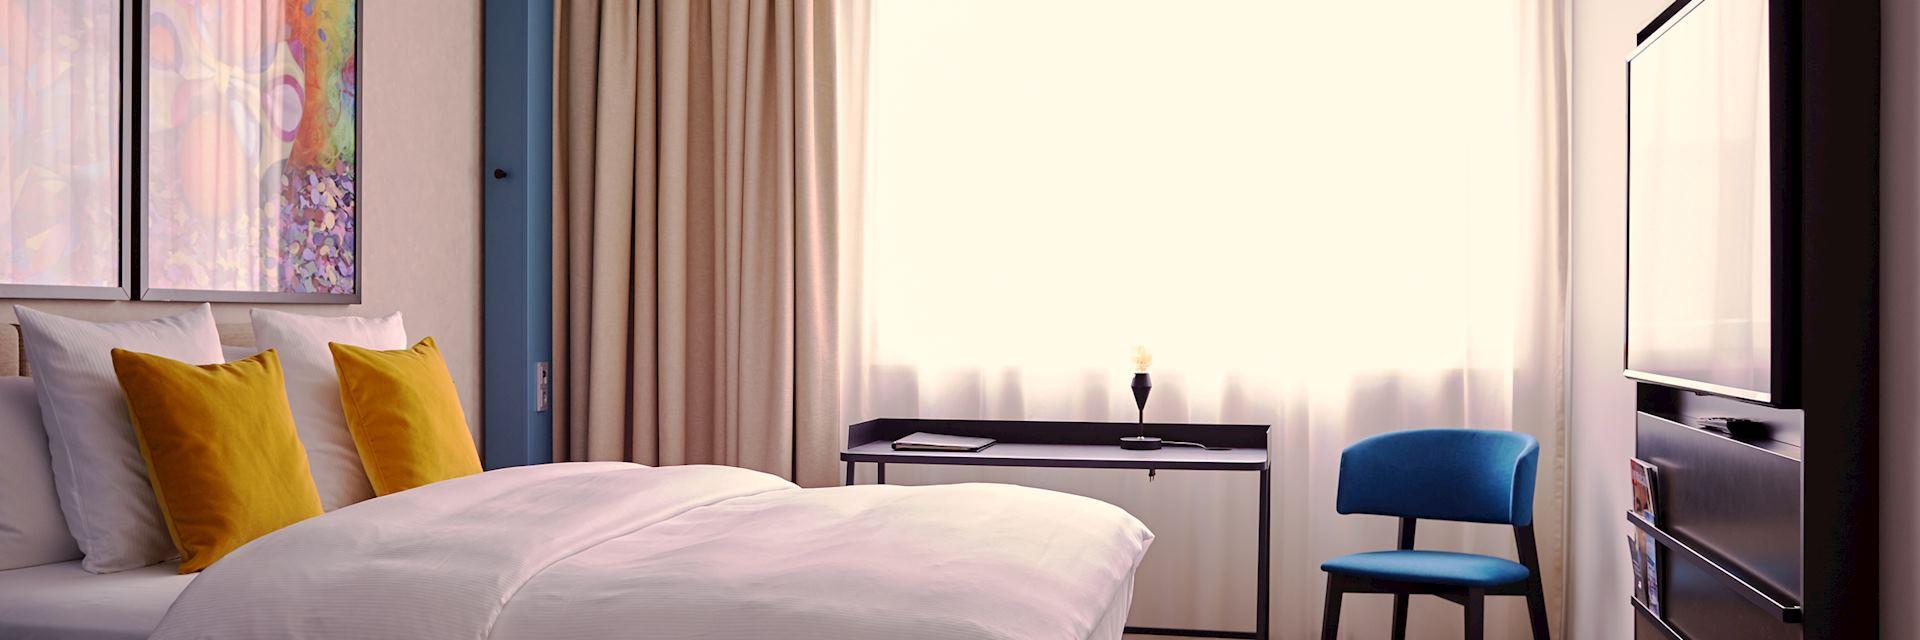 Hotel Mondial am Dom